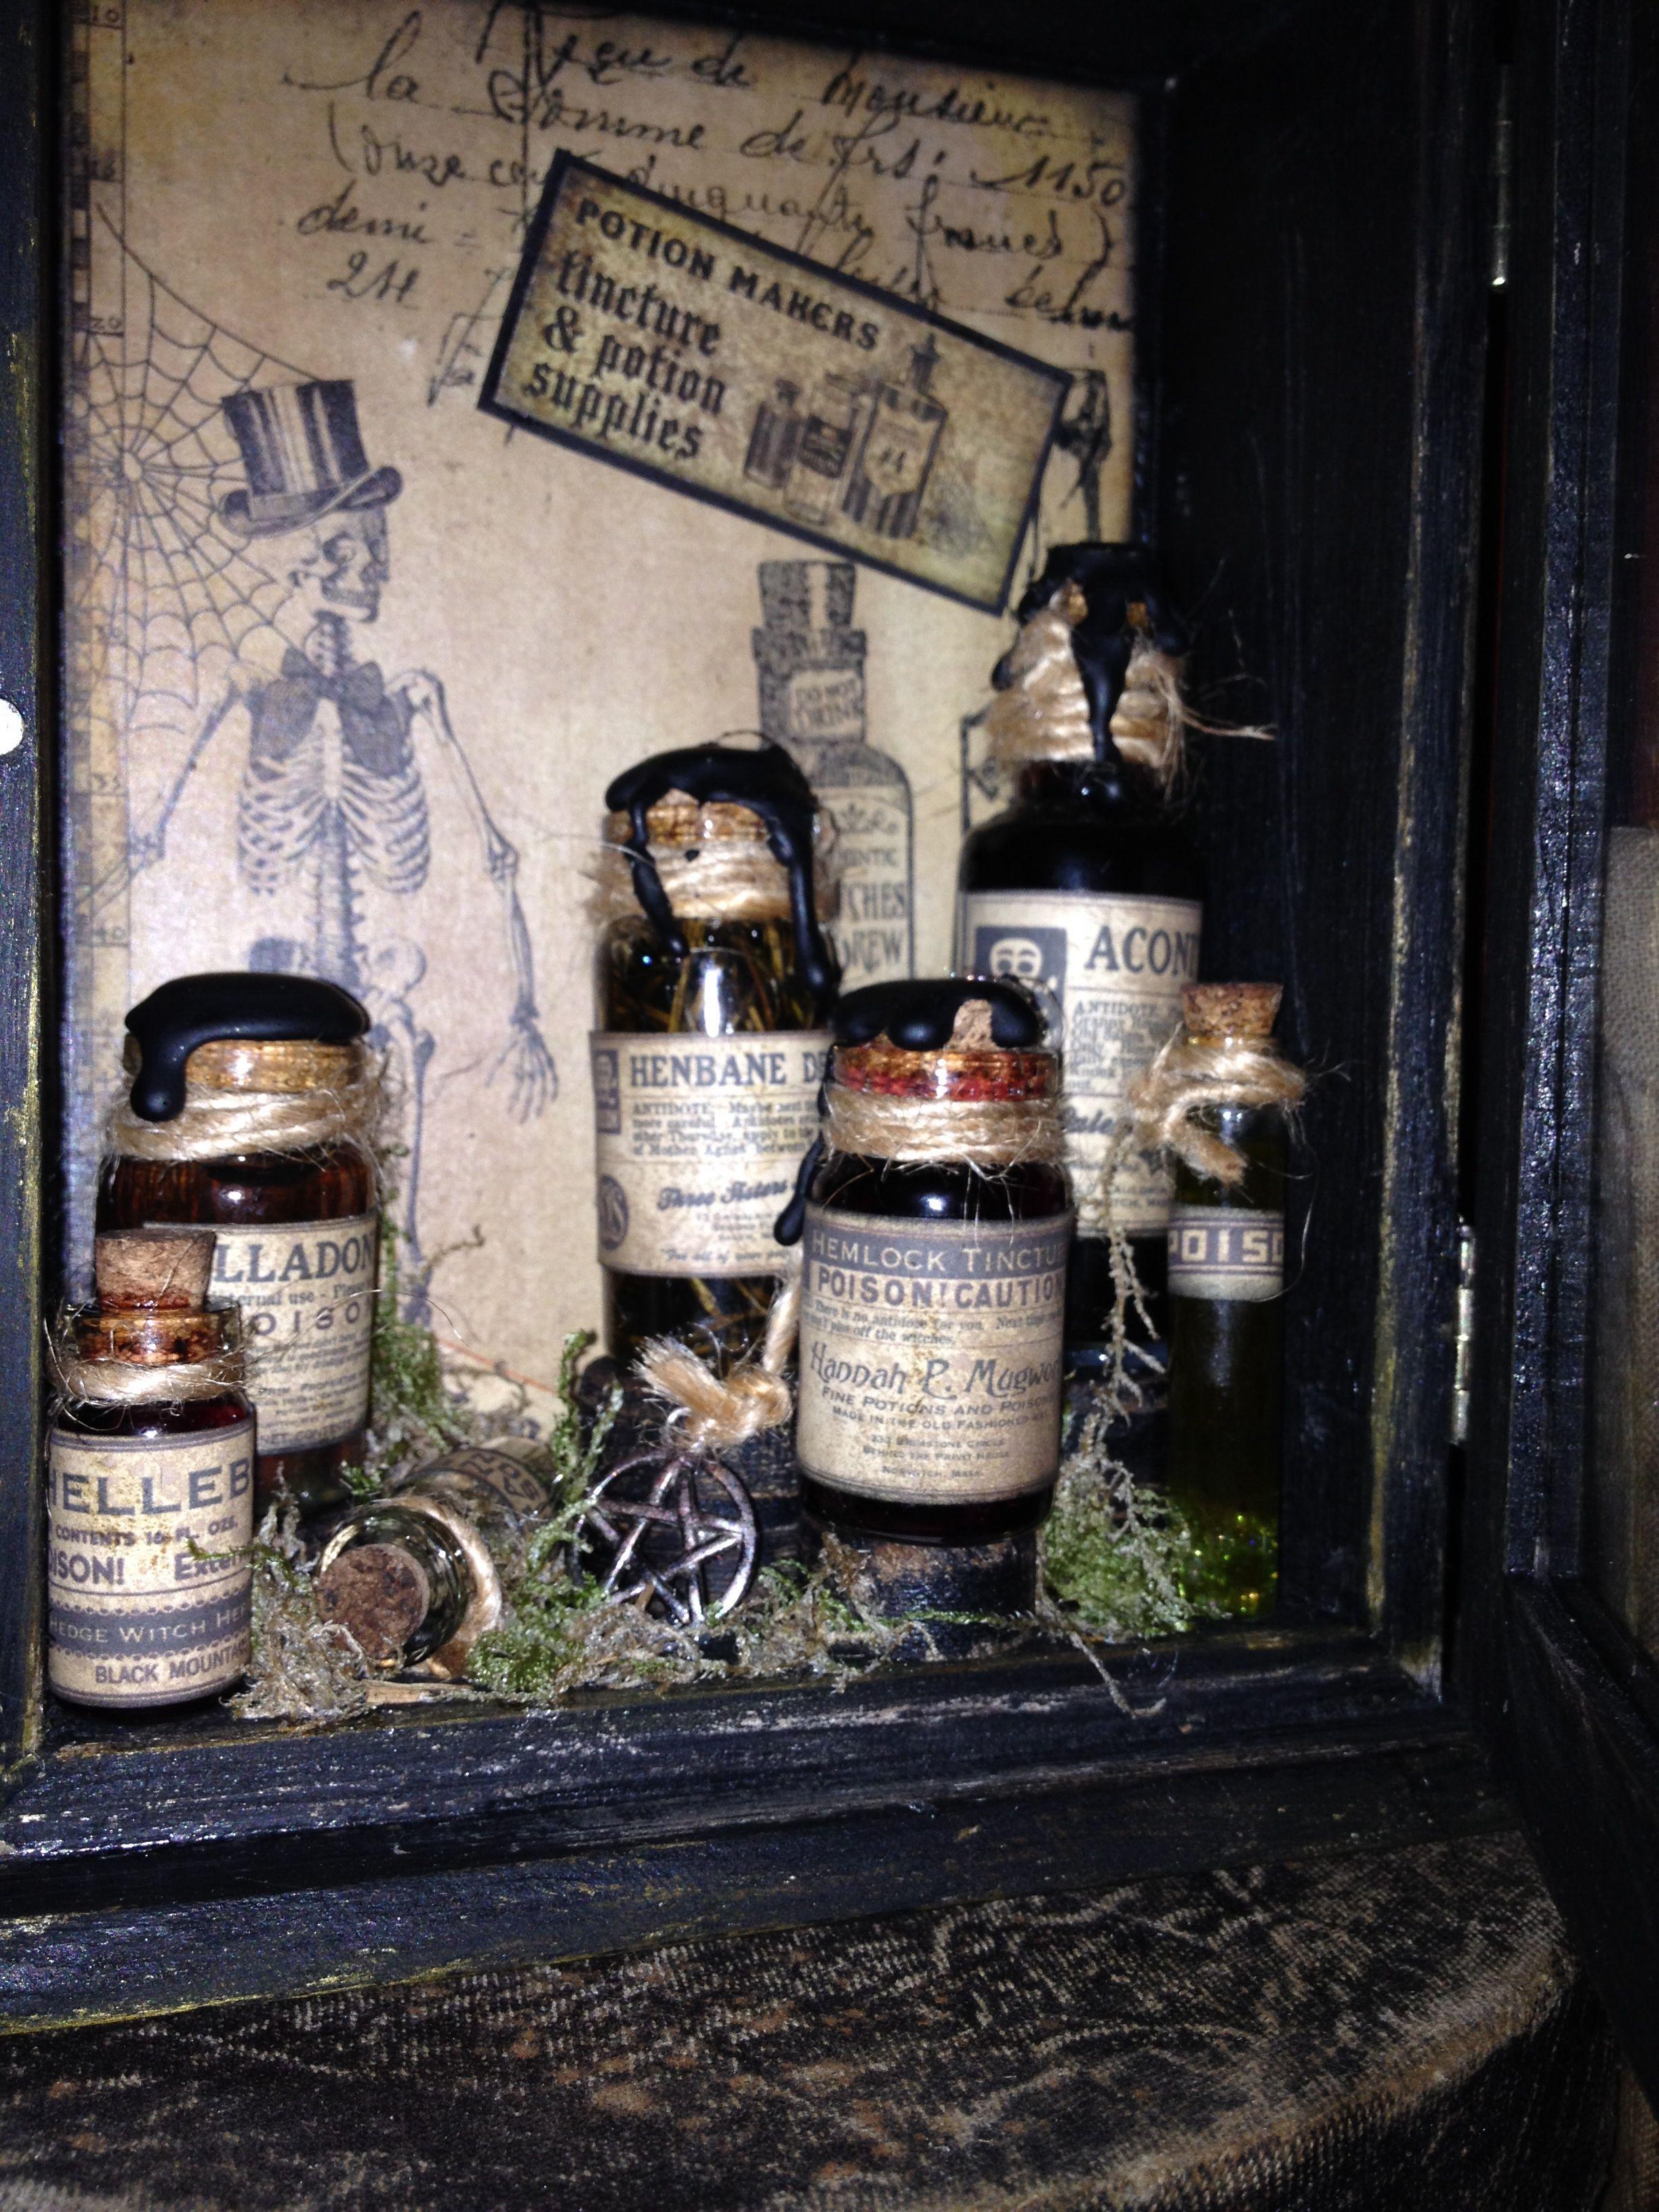 Witches Apothecary | Apothecary | Halloween apothecary, Apothecary